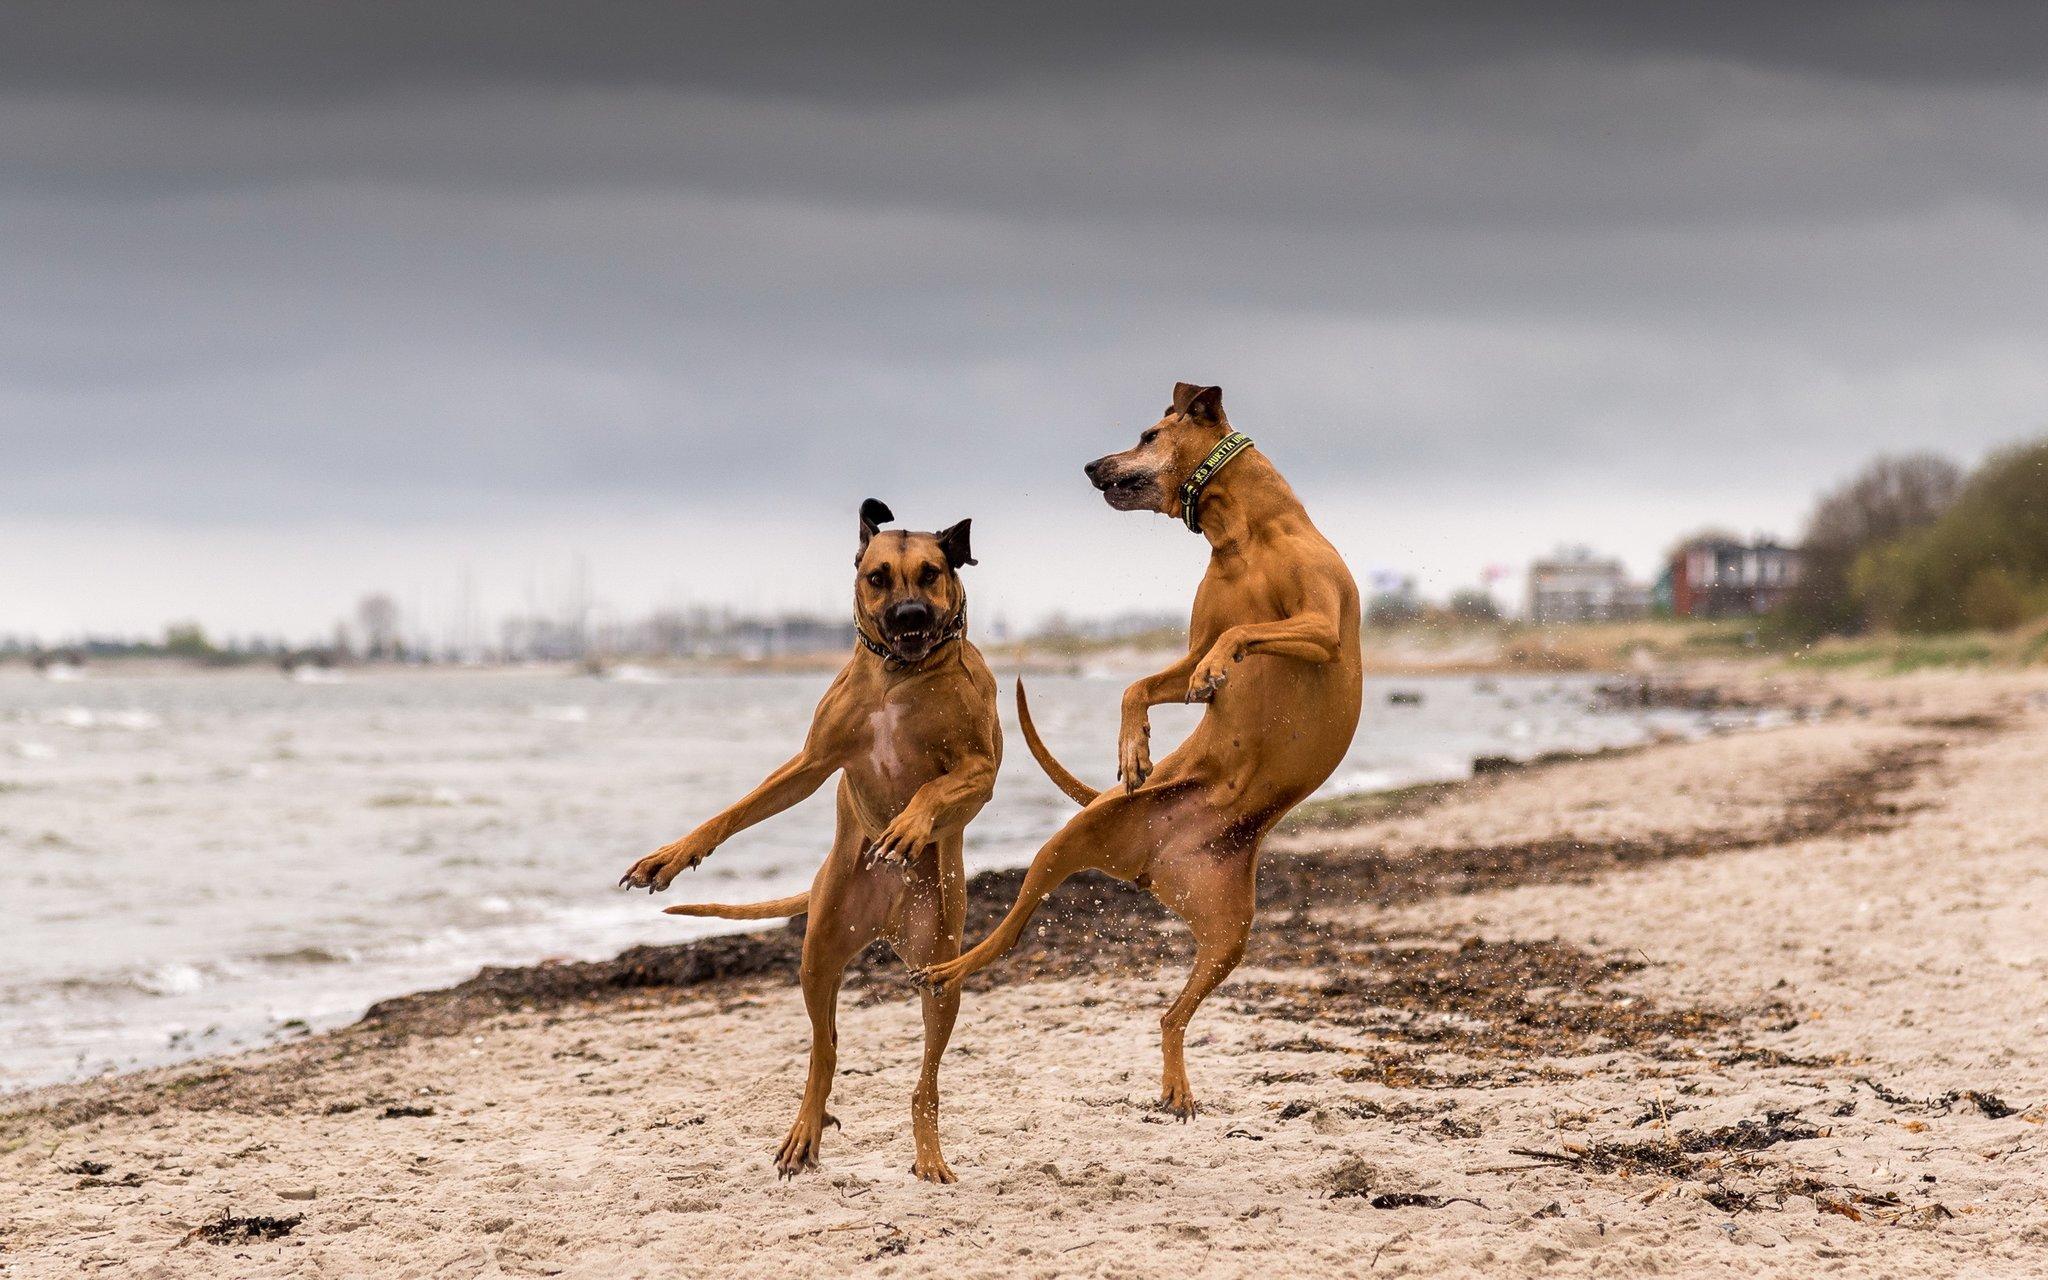 Собака прикольно танцует, открытки про